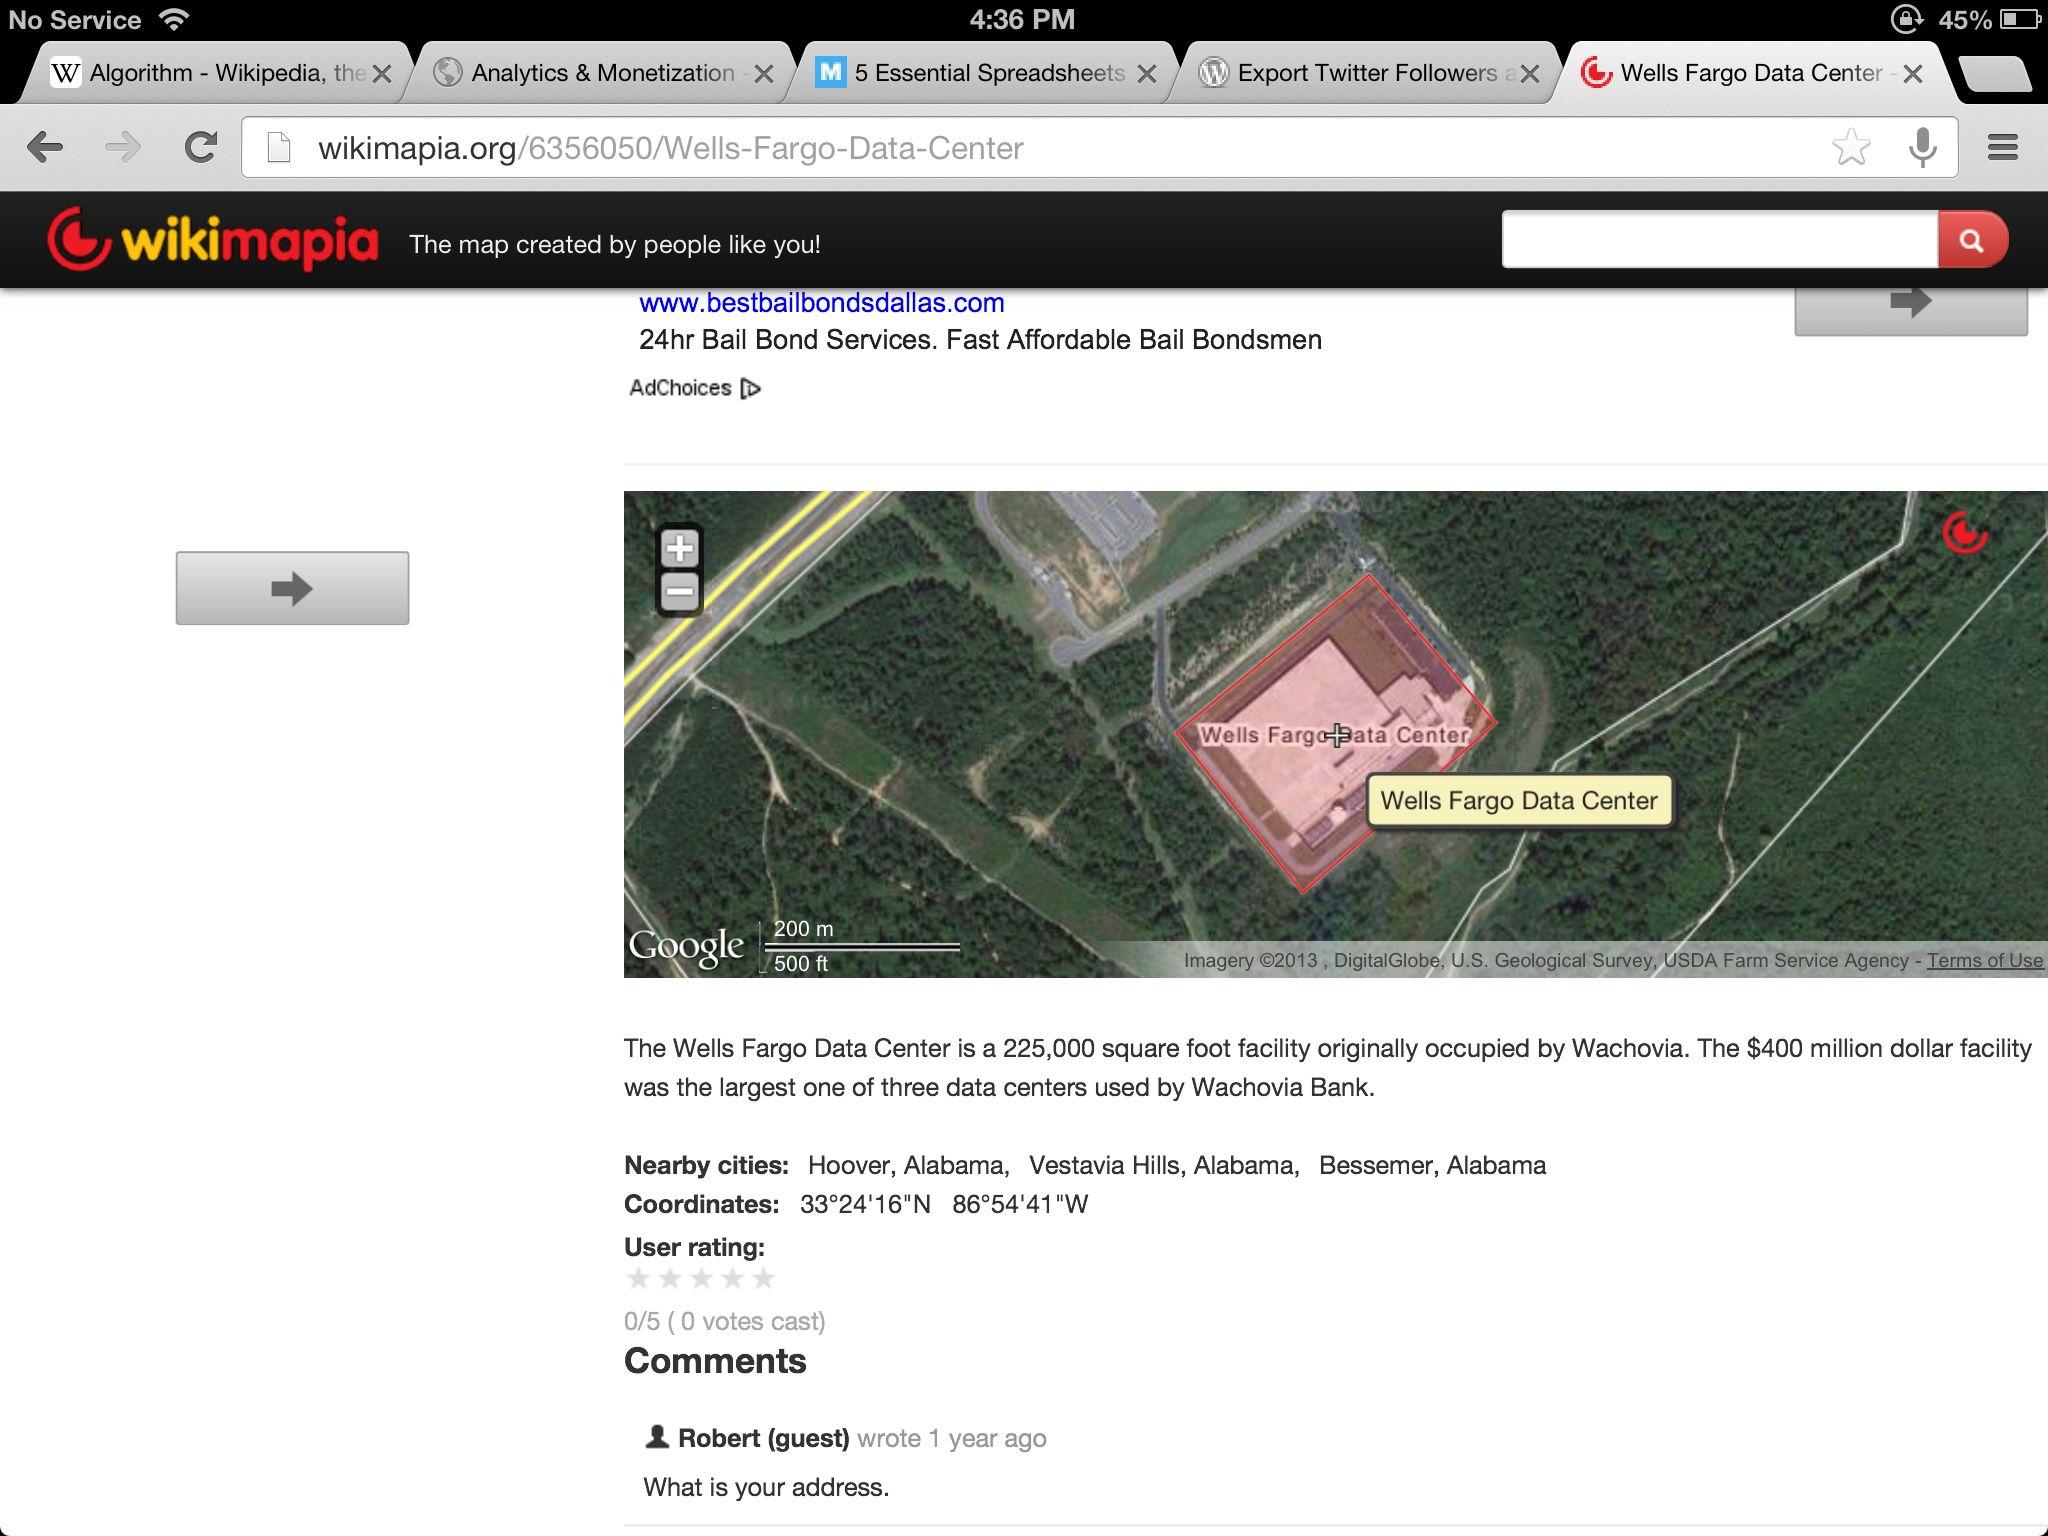 Wells Fargo Data Center, Oxmoor, Alabama. 400 million